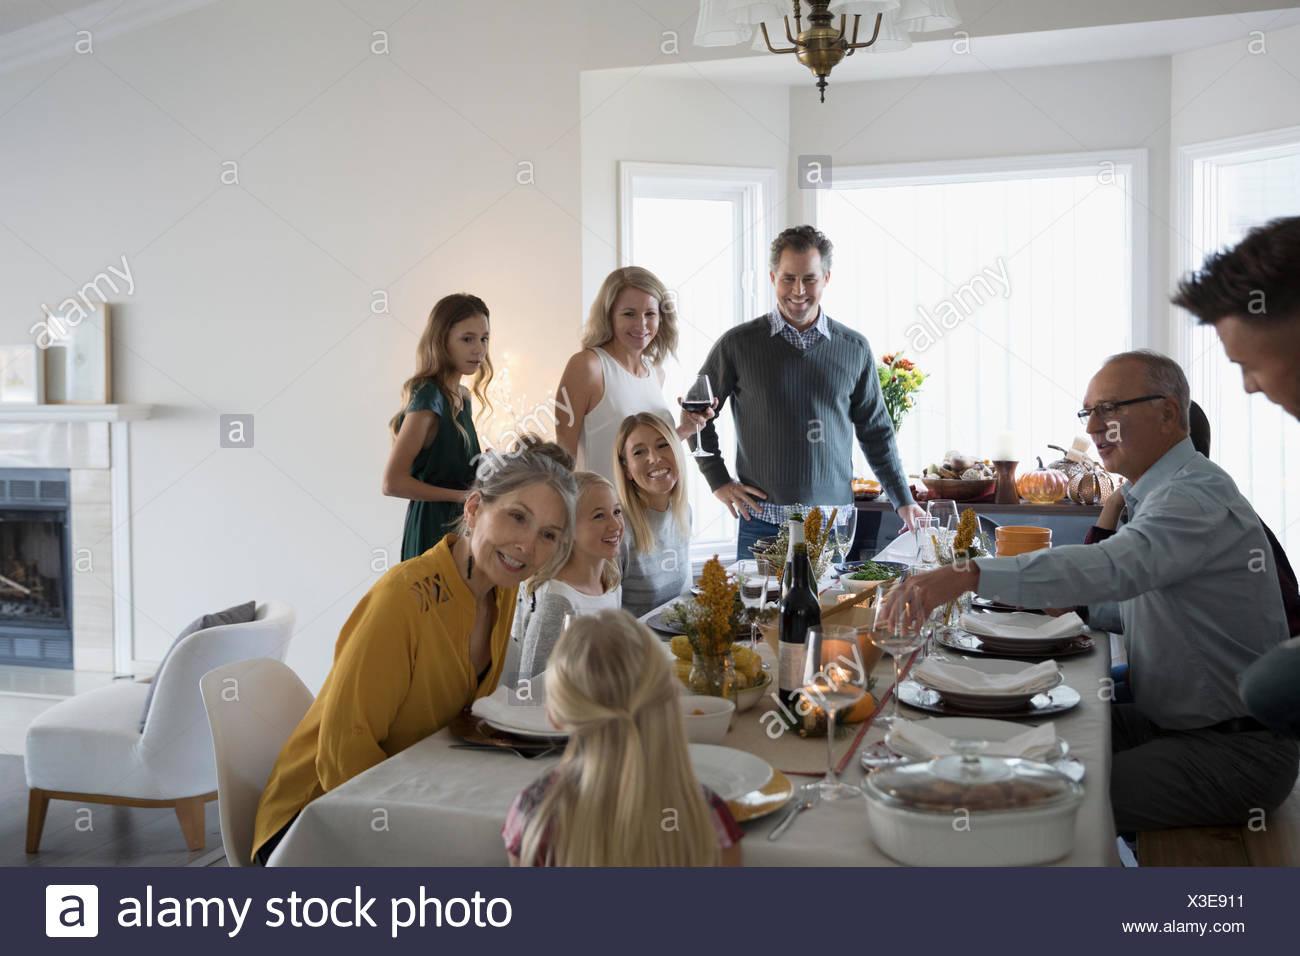 Multi-generation family enjoying Thanksgiving dinner at table - Stock Image